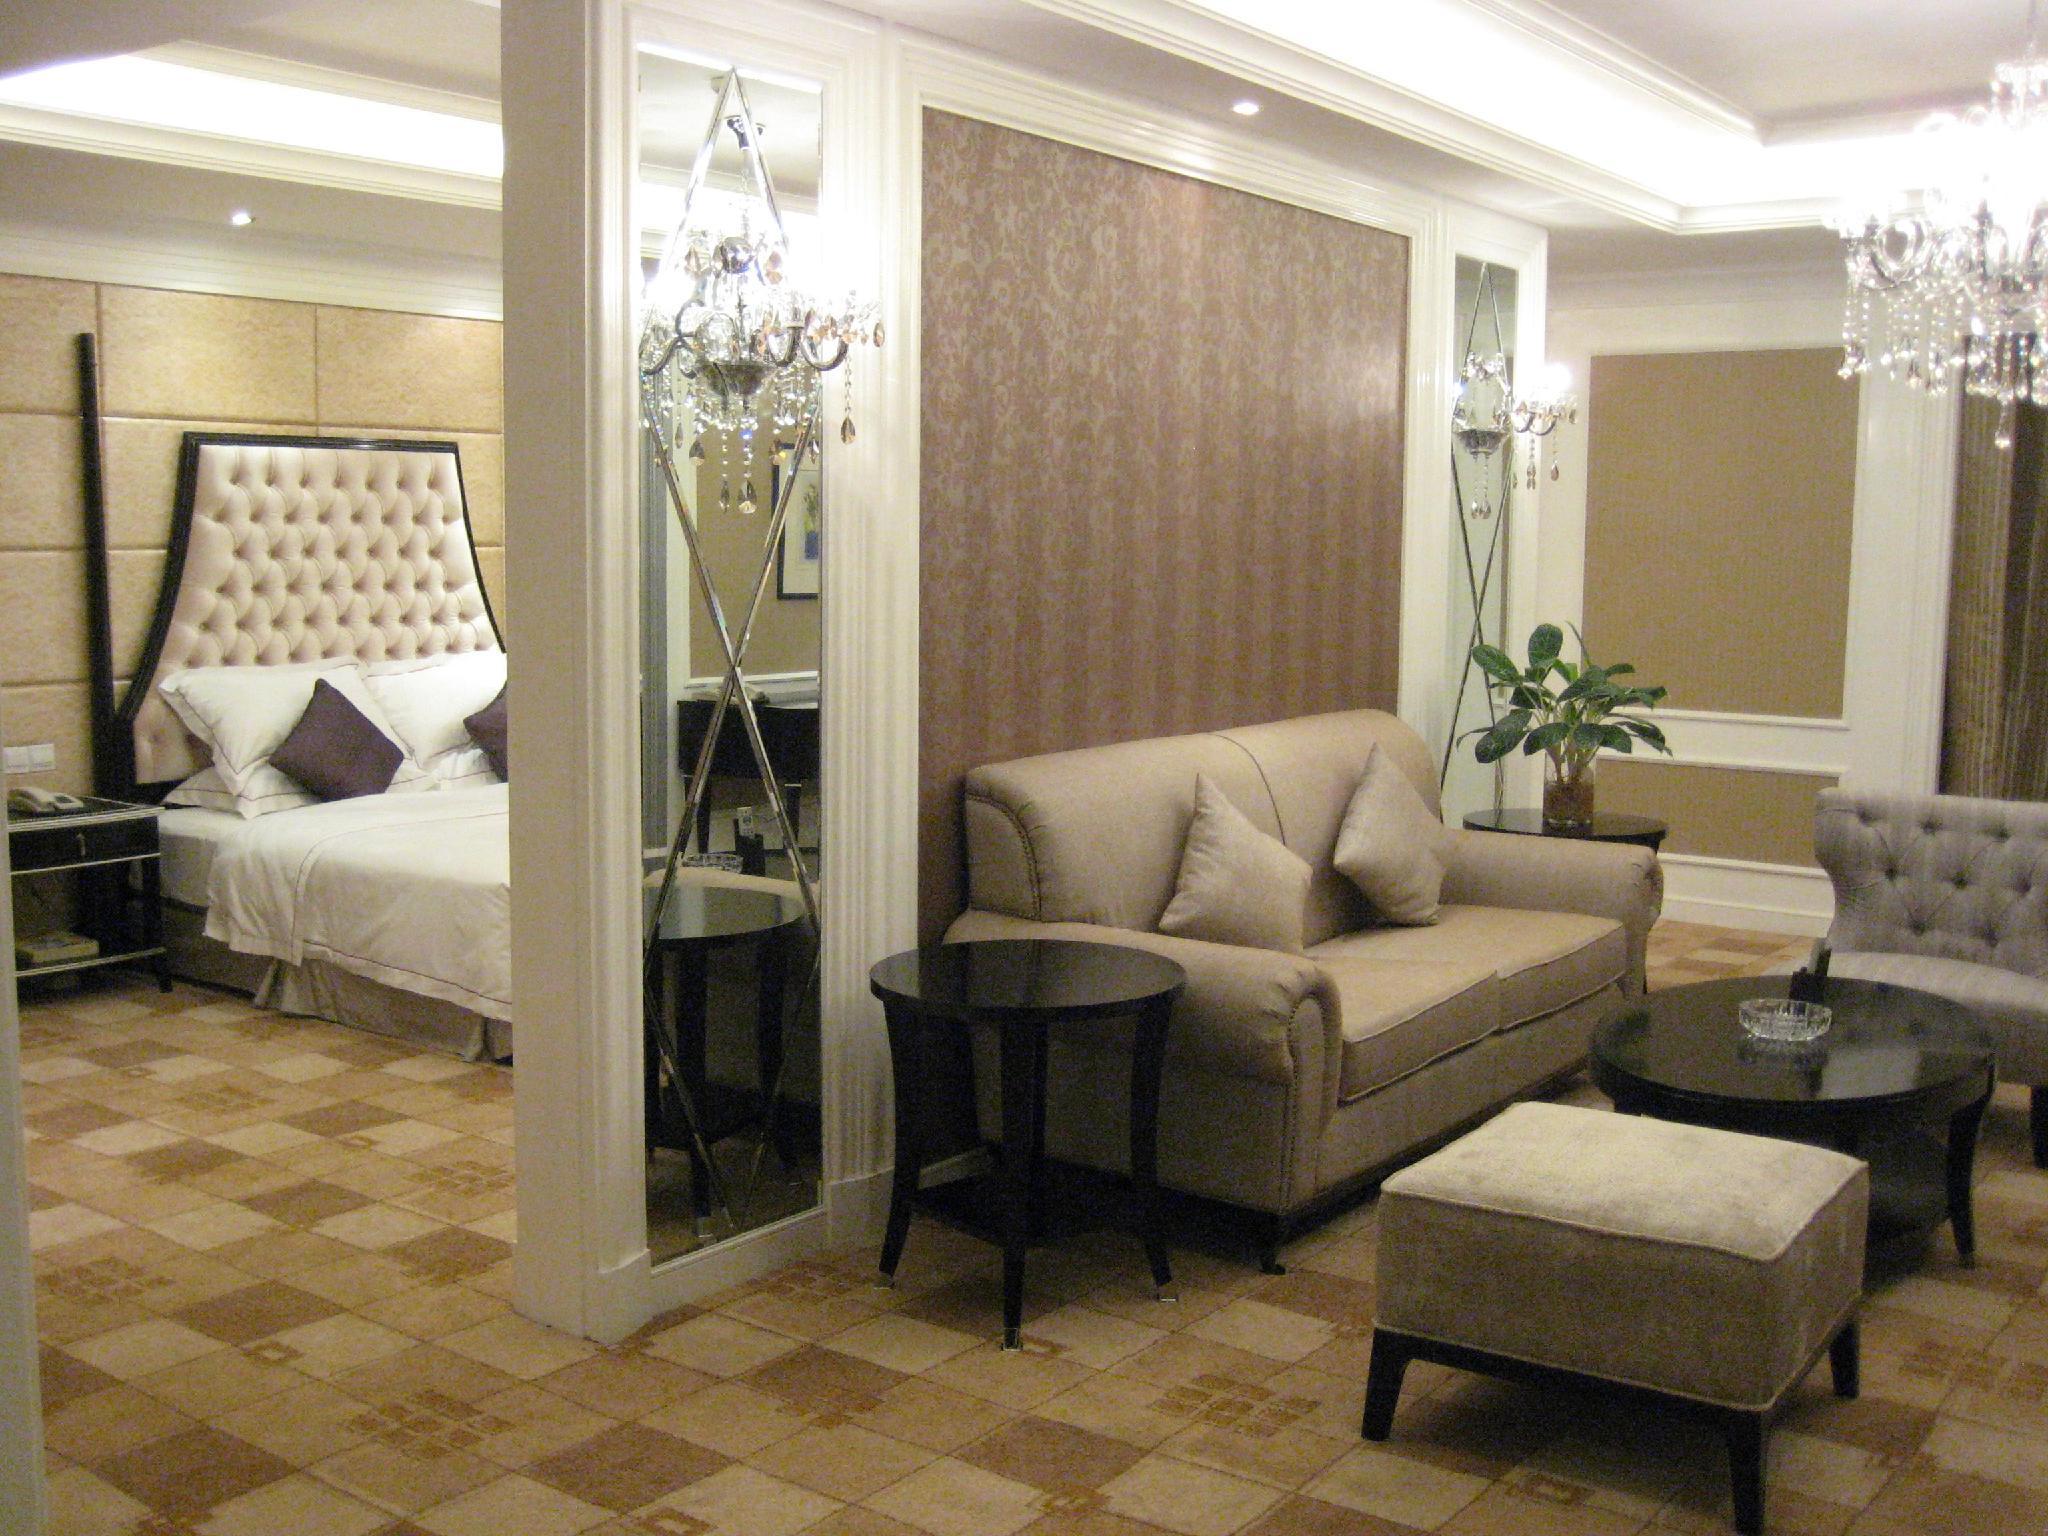 country garden flower city hotel in foshan - room deals, photos